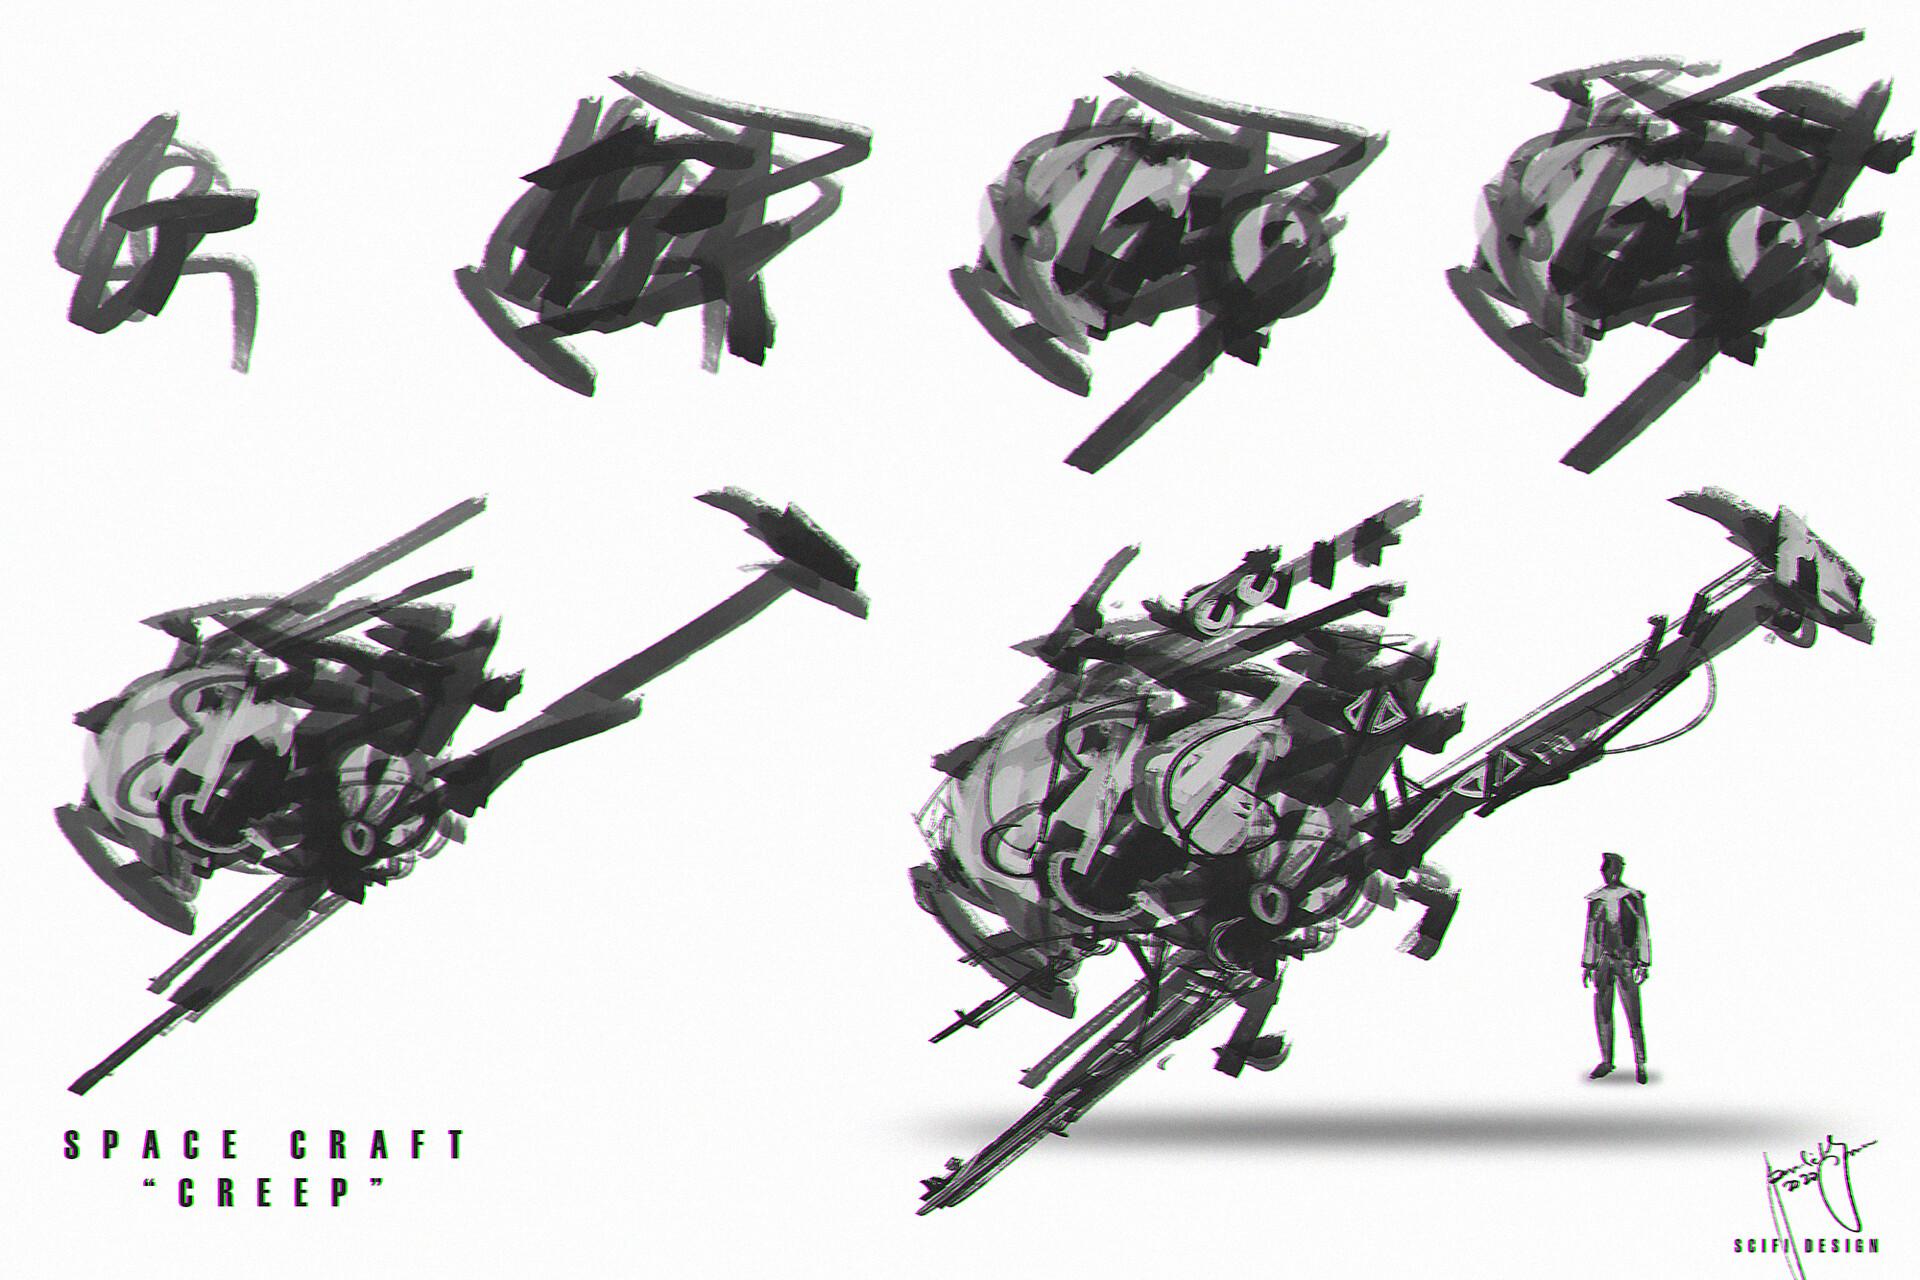 Space Craft Creep